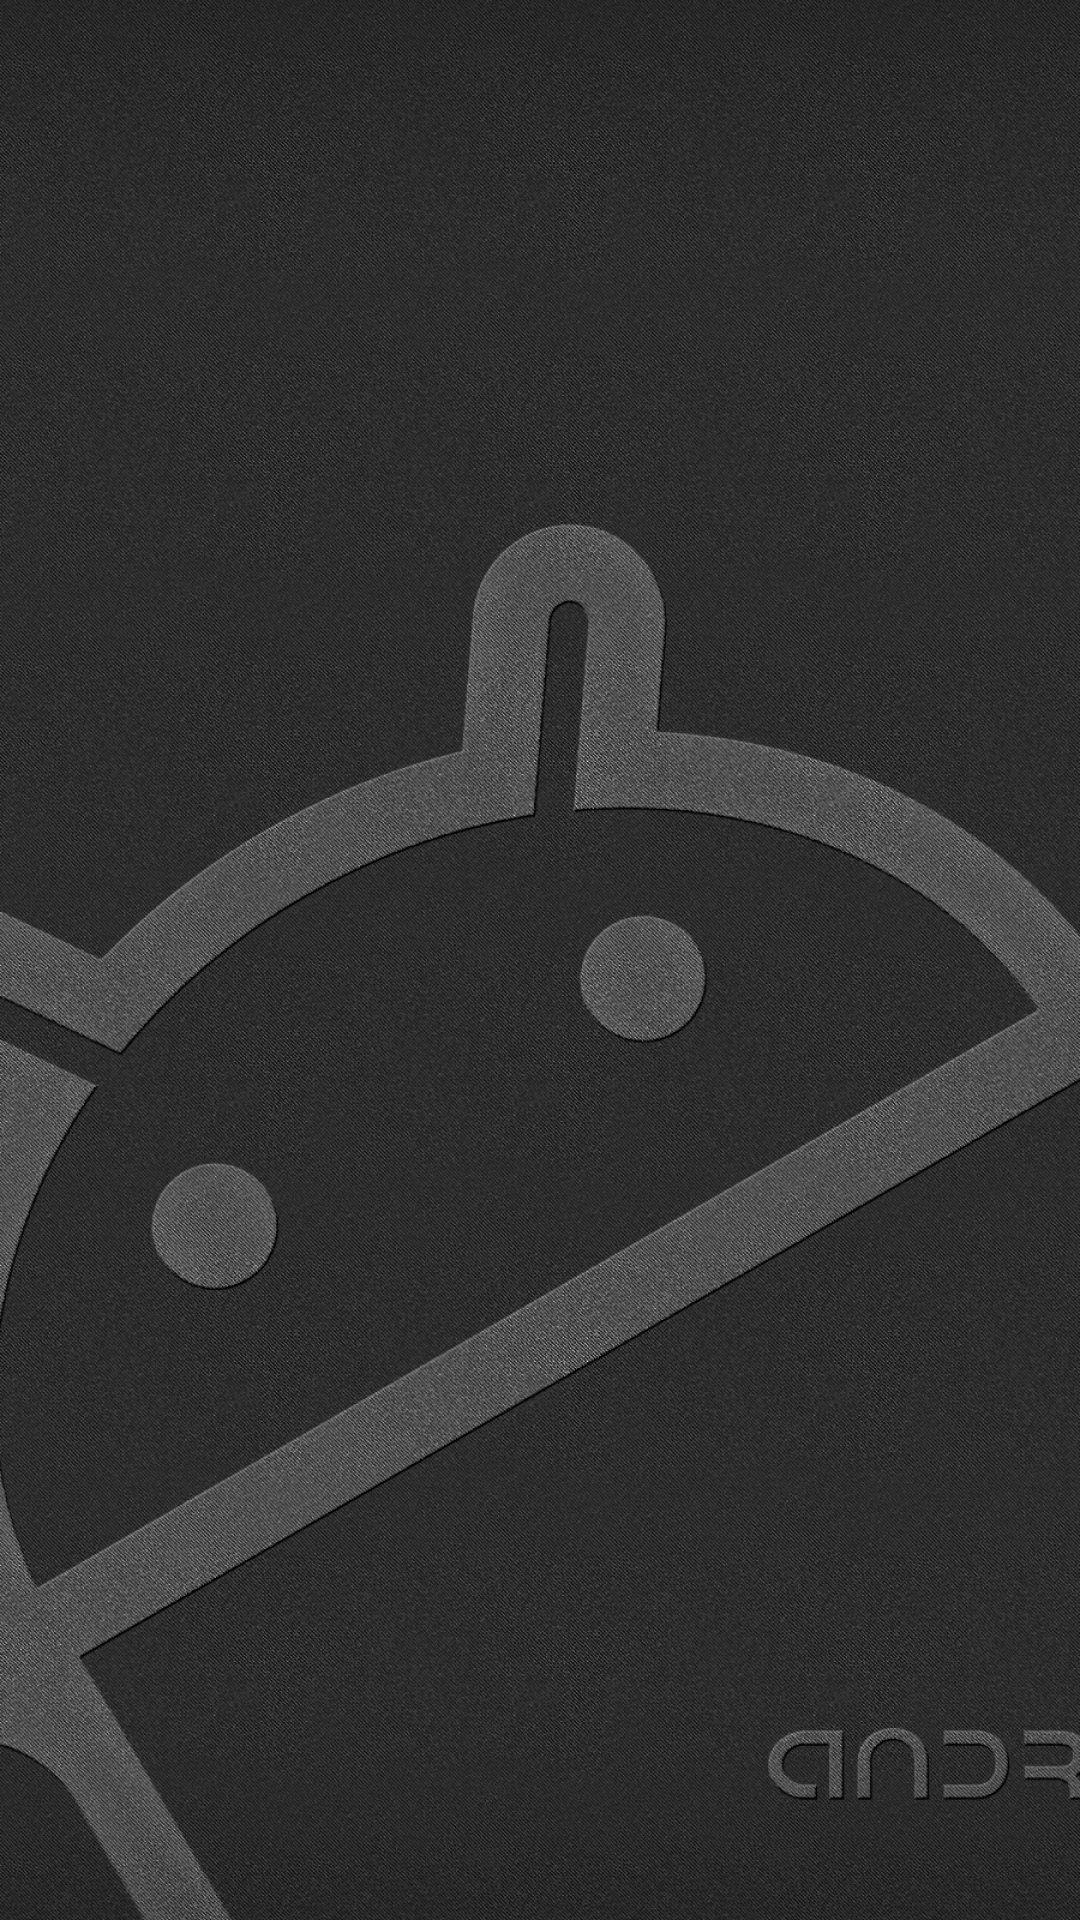 how to change cyanogenmod lock screen wallpaper set new one